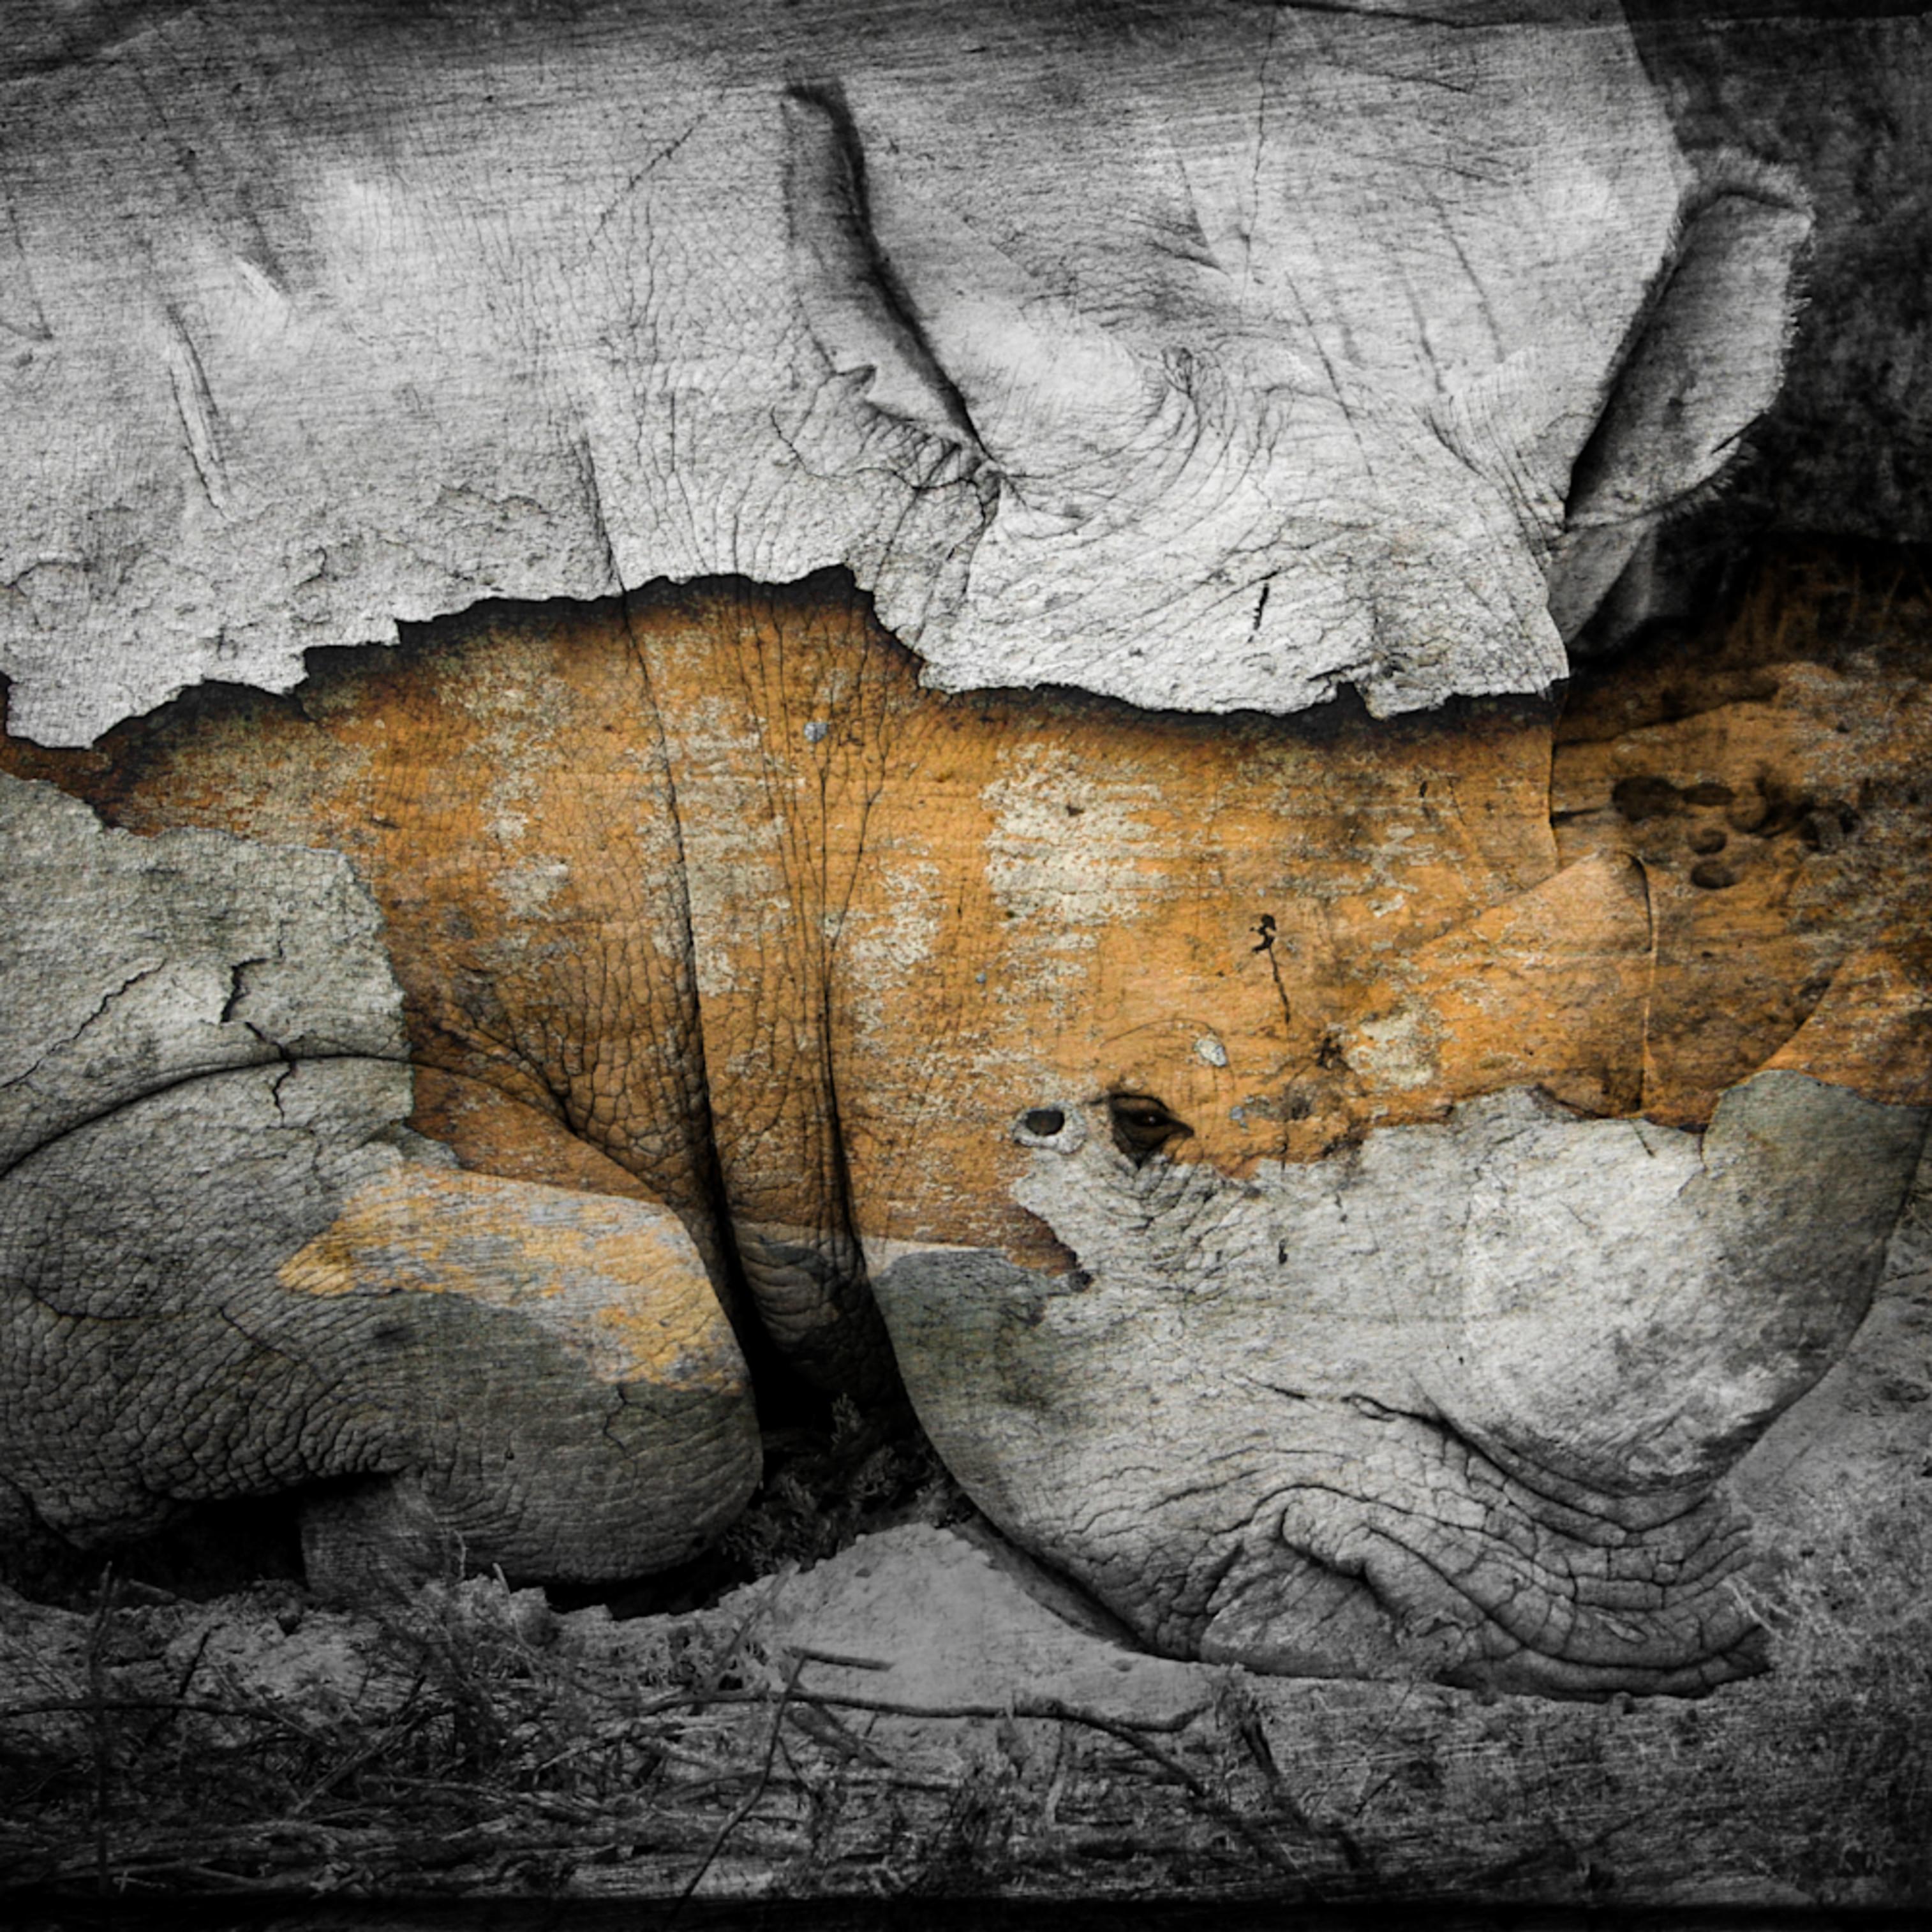 Favorite rhino split dsc06611 asf v5pdpa